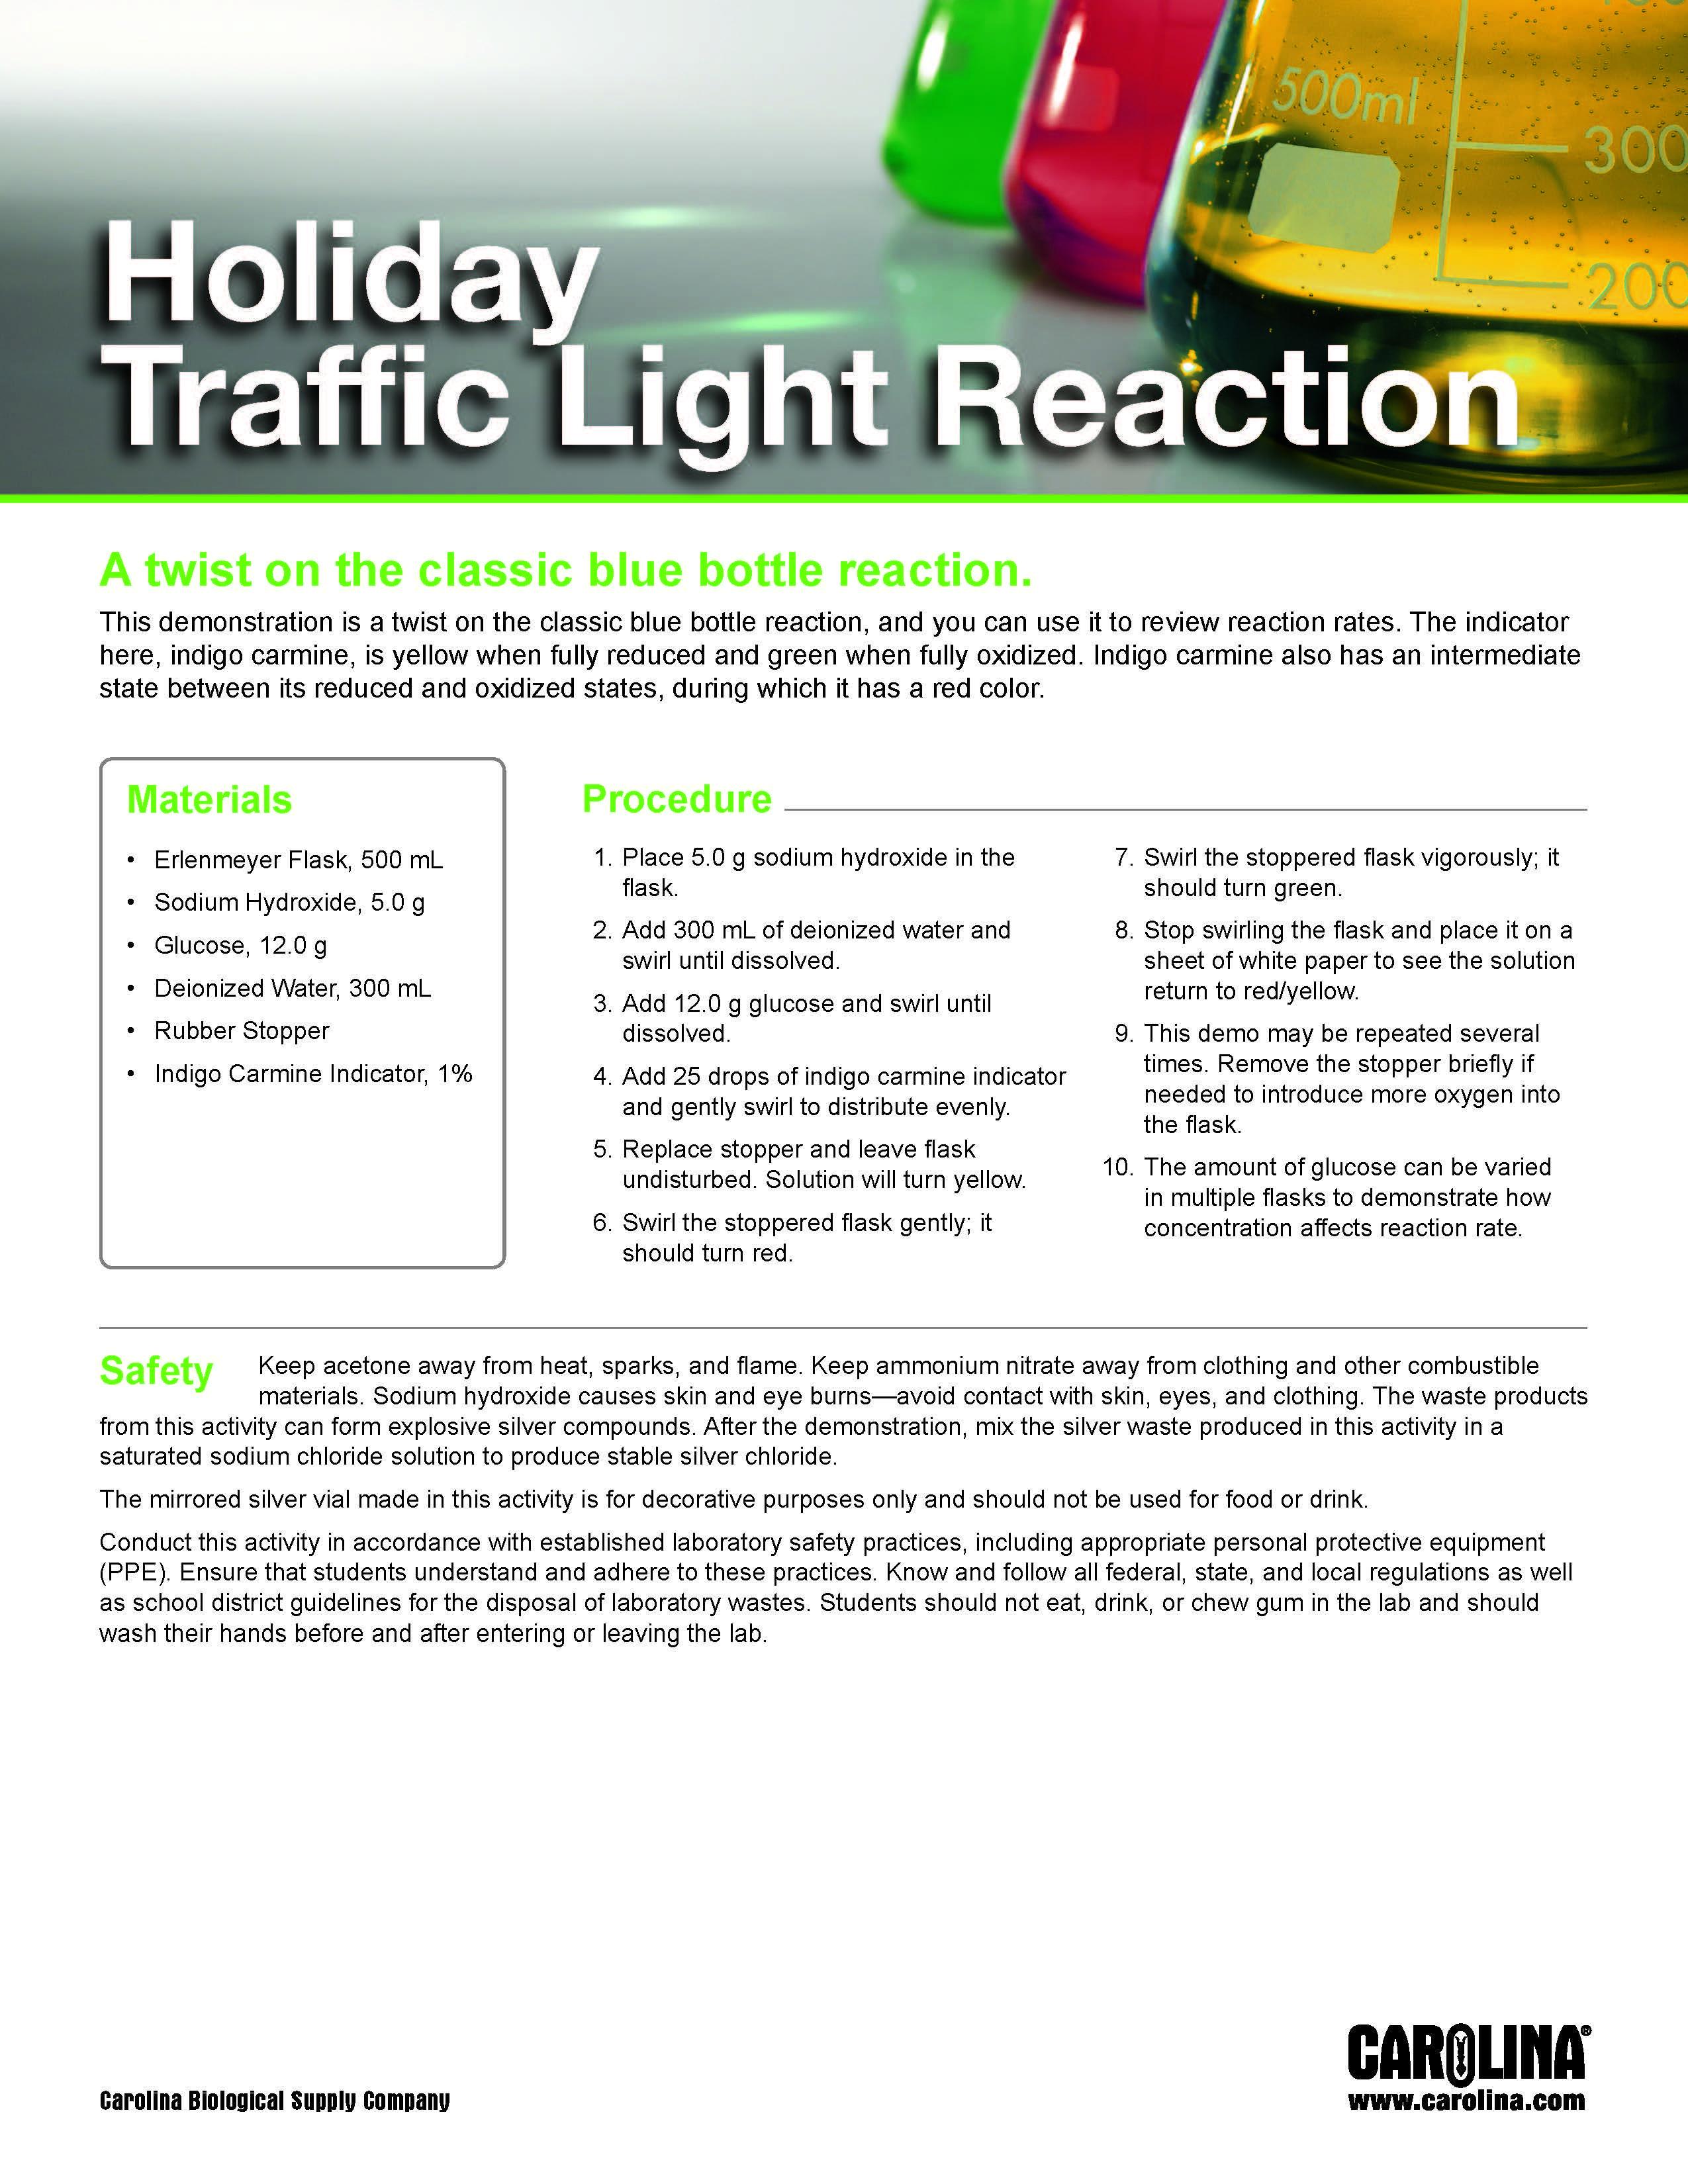 Holiday Traffic Light Reaction Activity